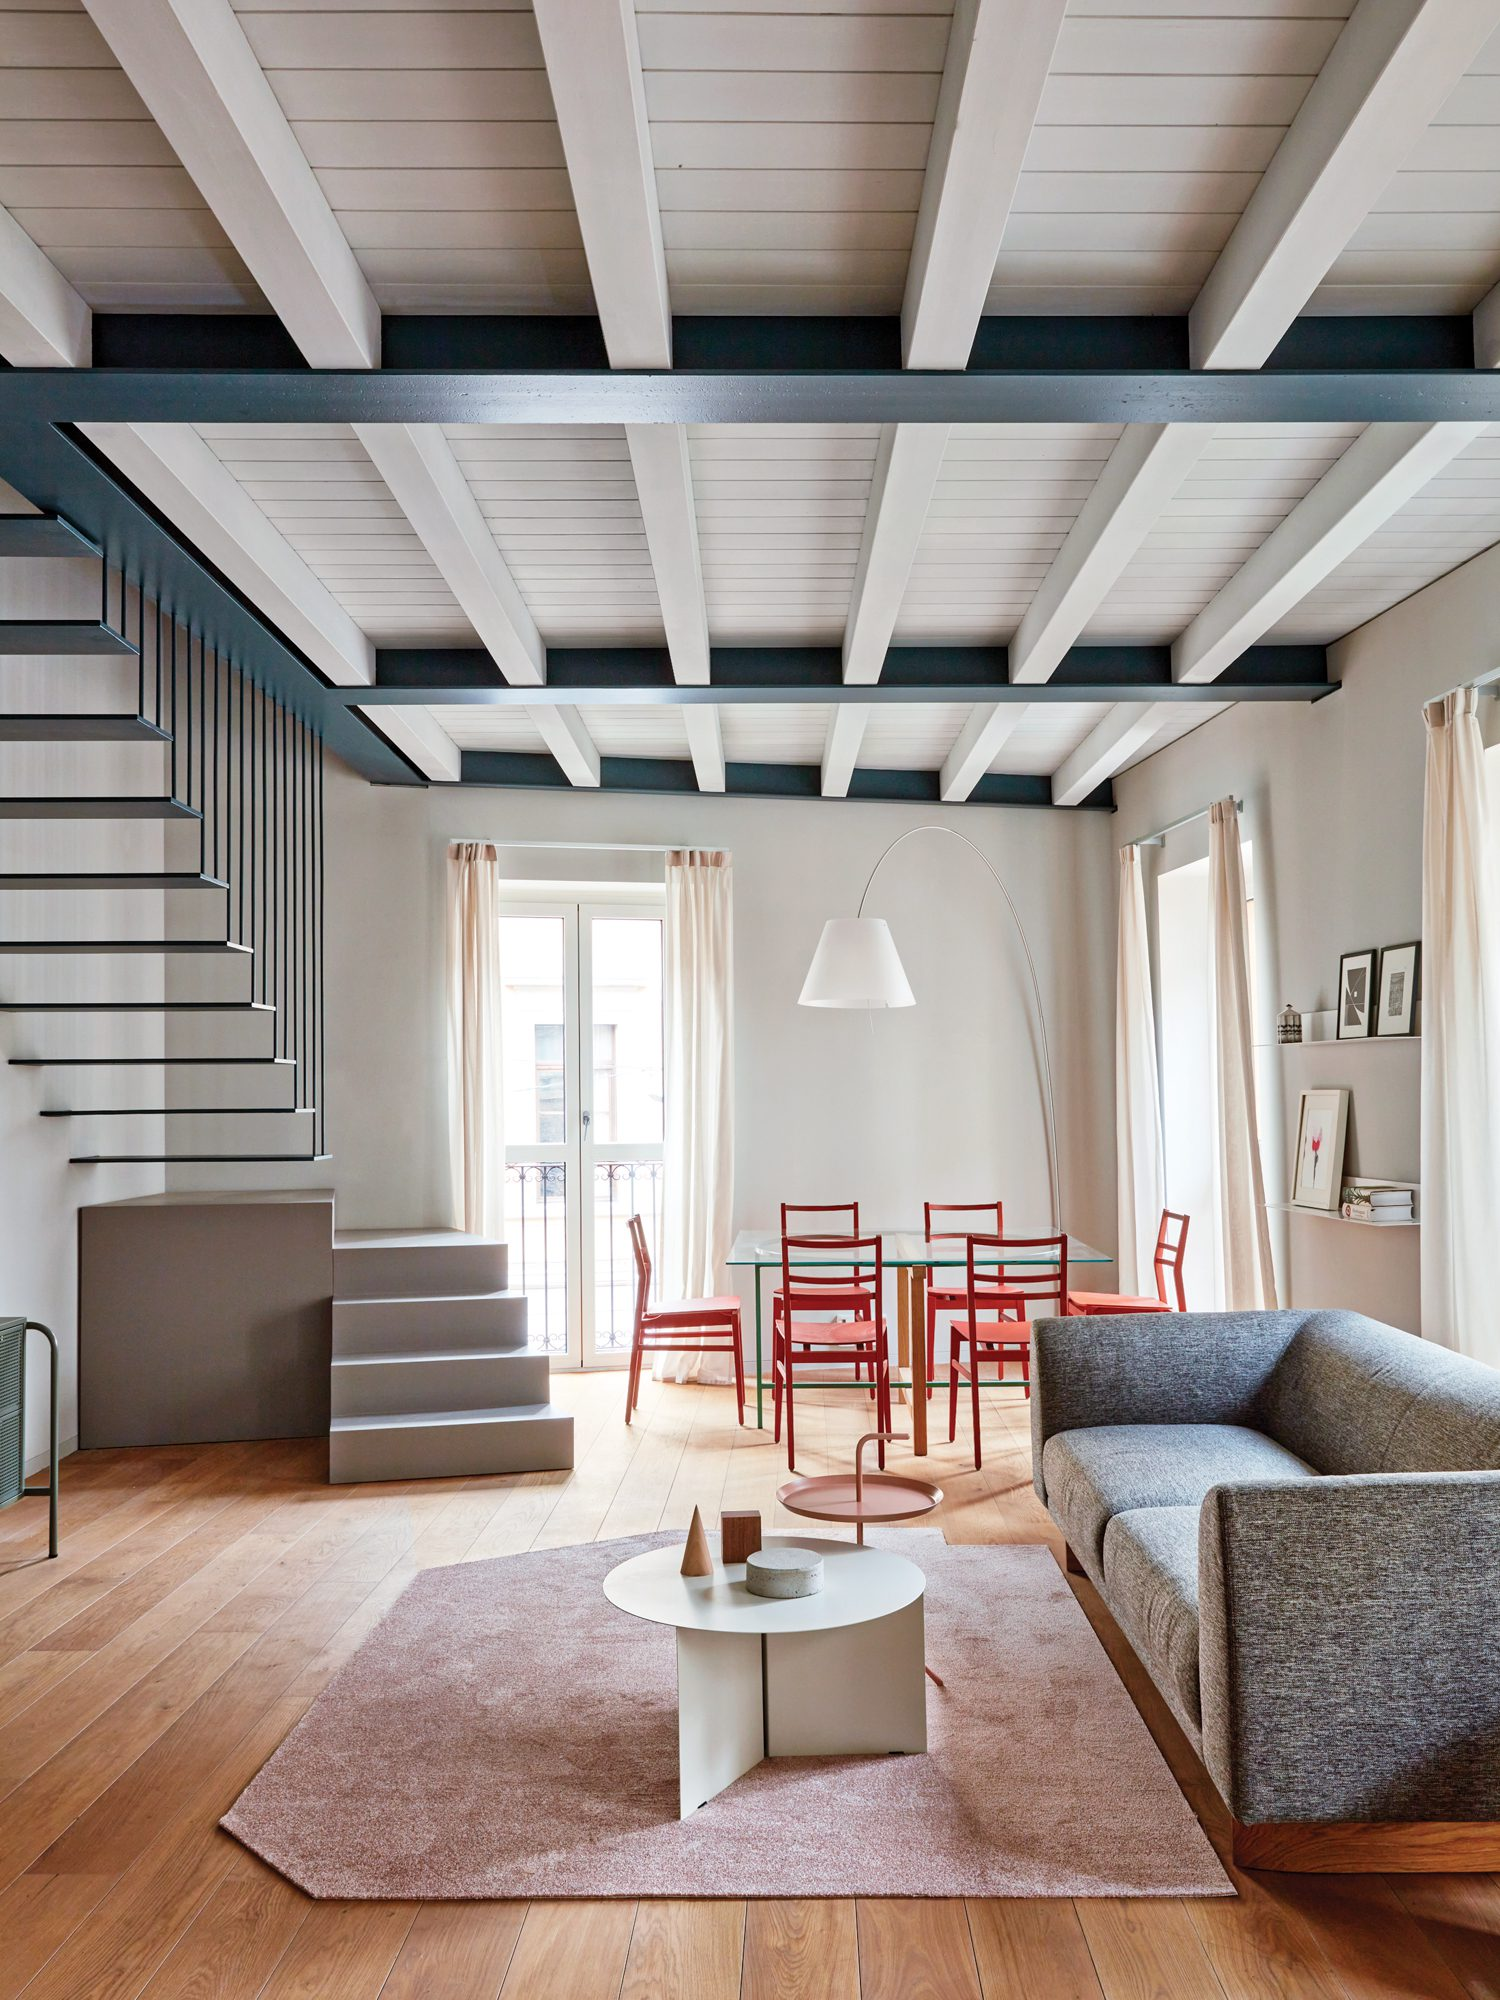 Milan home by Itch Società d'Architettura